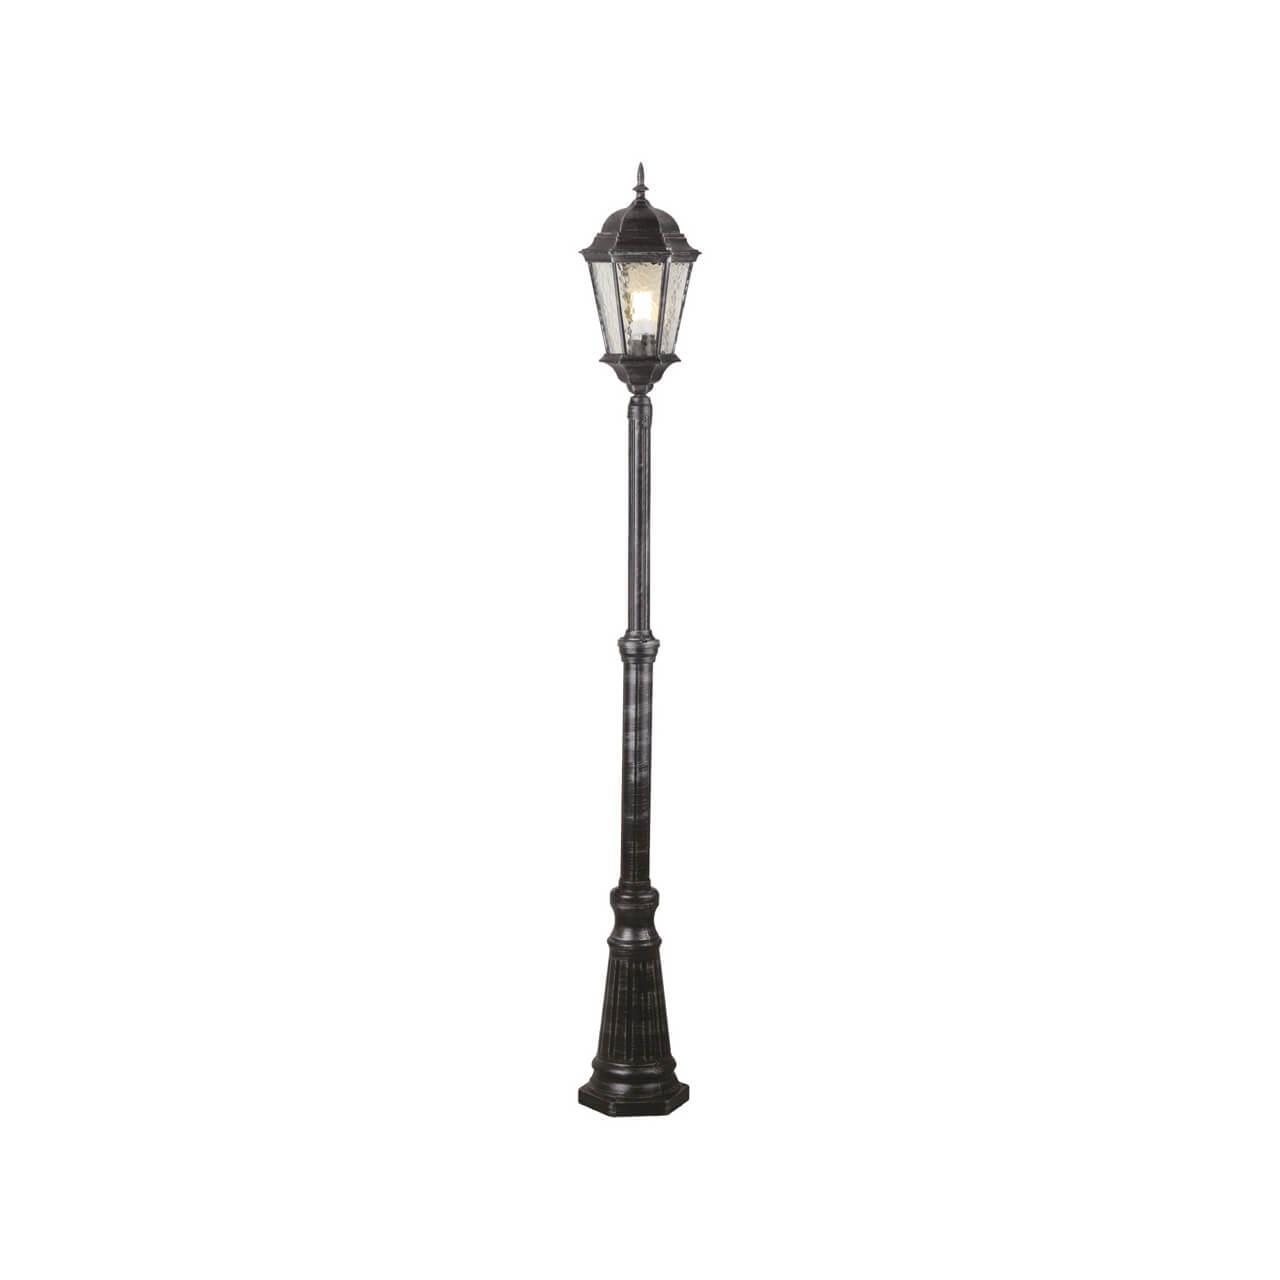 Садово-парковый светильник Arte Lamp Genova A1207PA-1BS arte lamp a1207pa 1bs